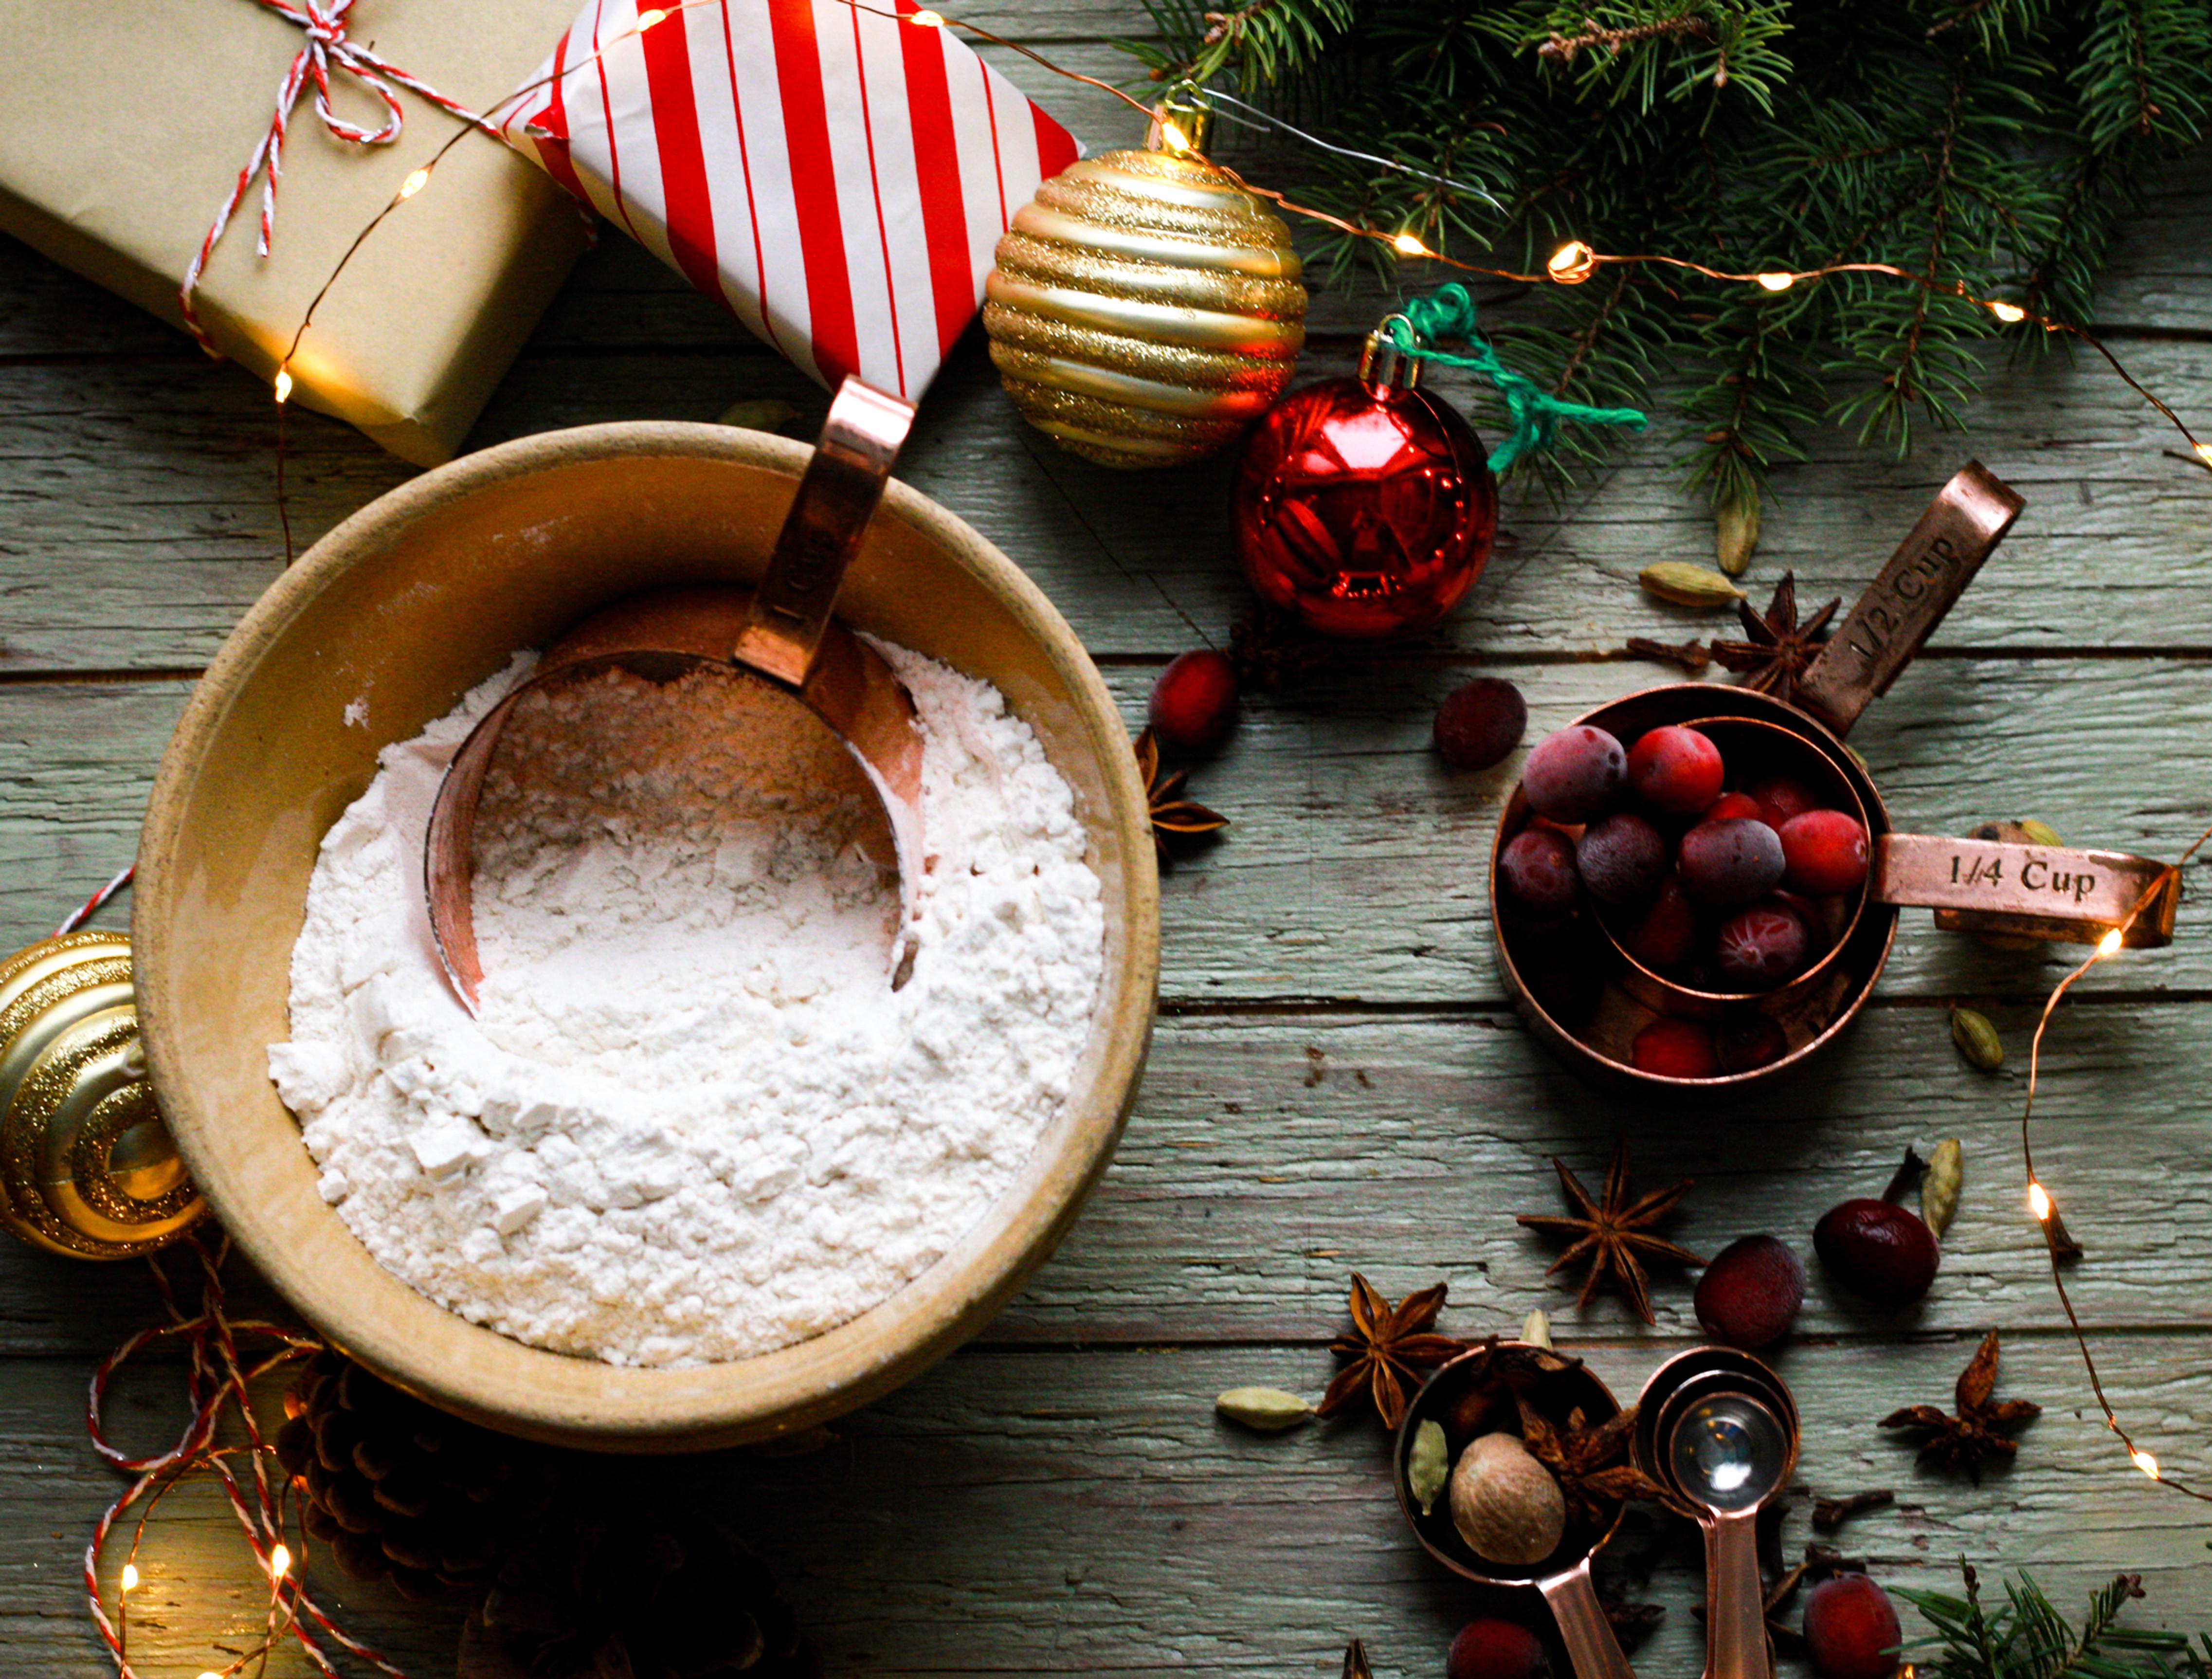 Christmas Bake Off, 3pm Wed 22 December